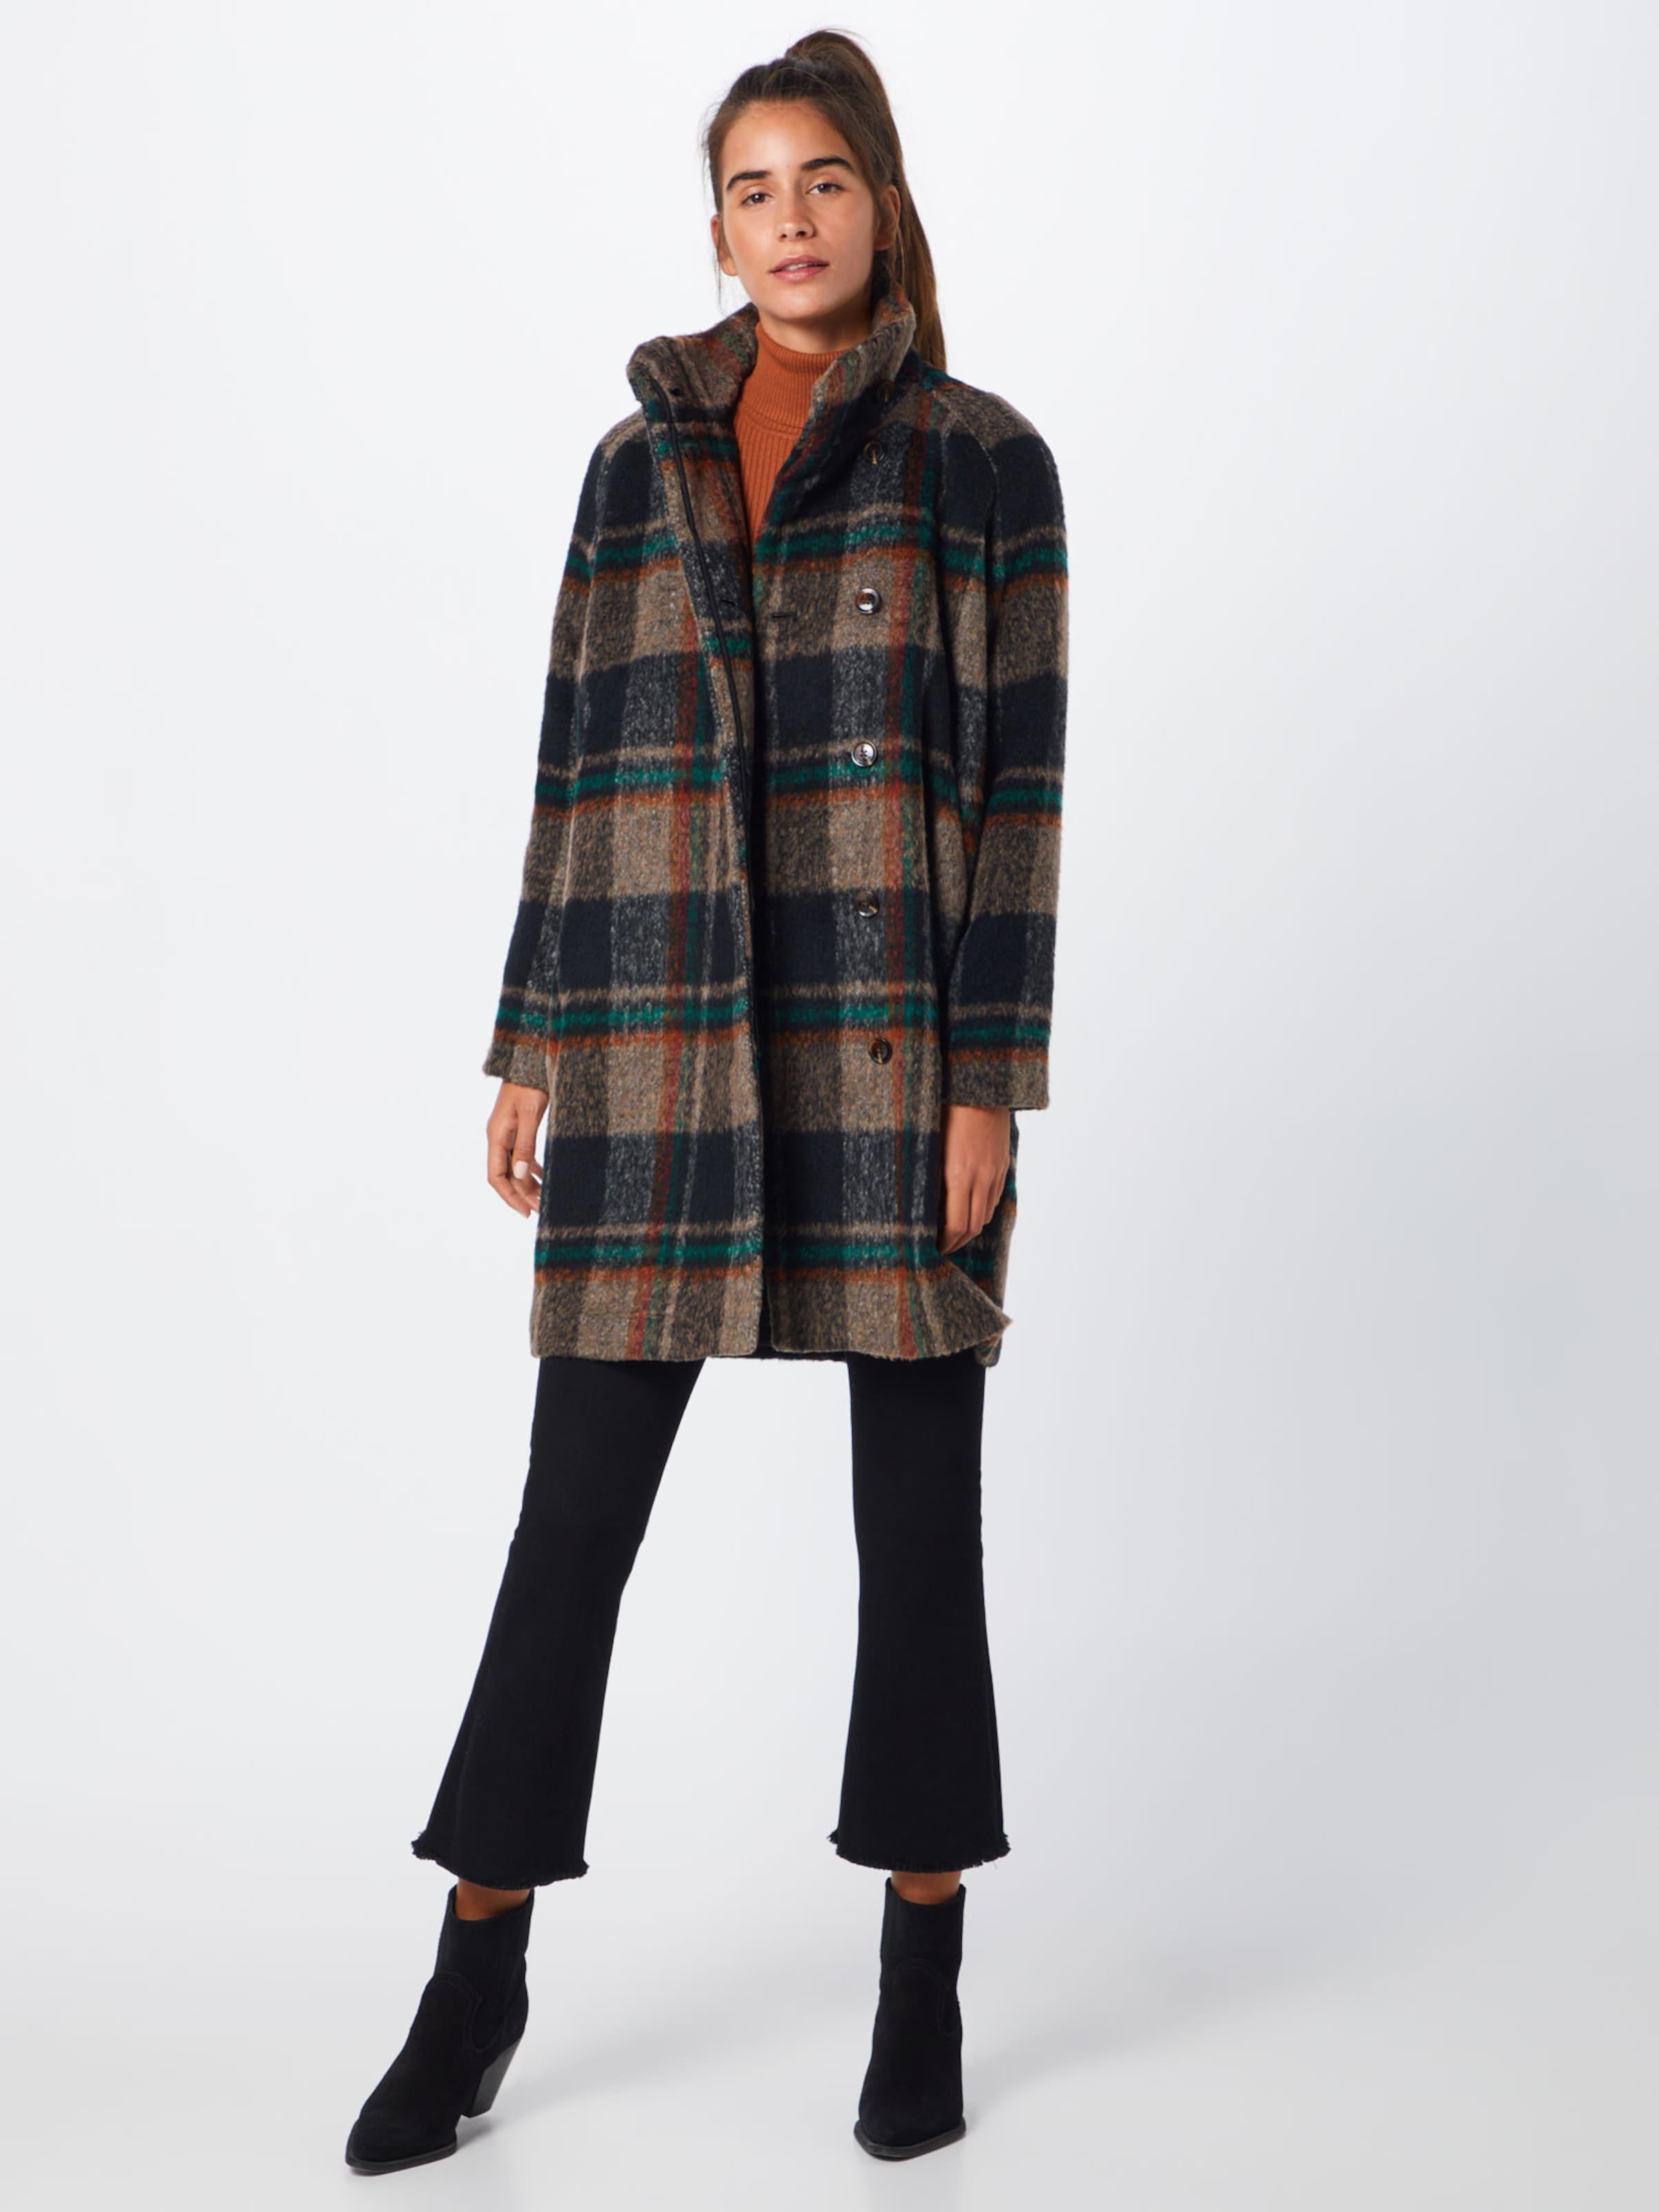 Mantel In Jacket 'hoff Samsoeamp; Schwarz 10616' BraunTanne tsQChrd